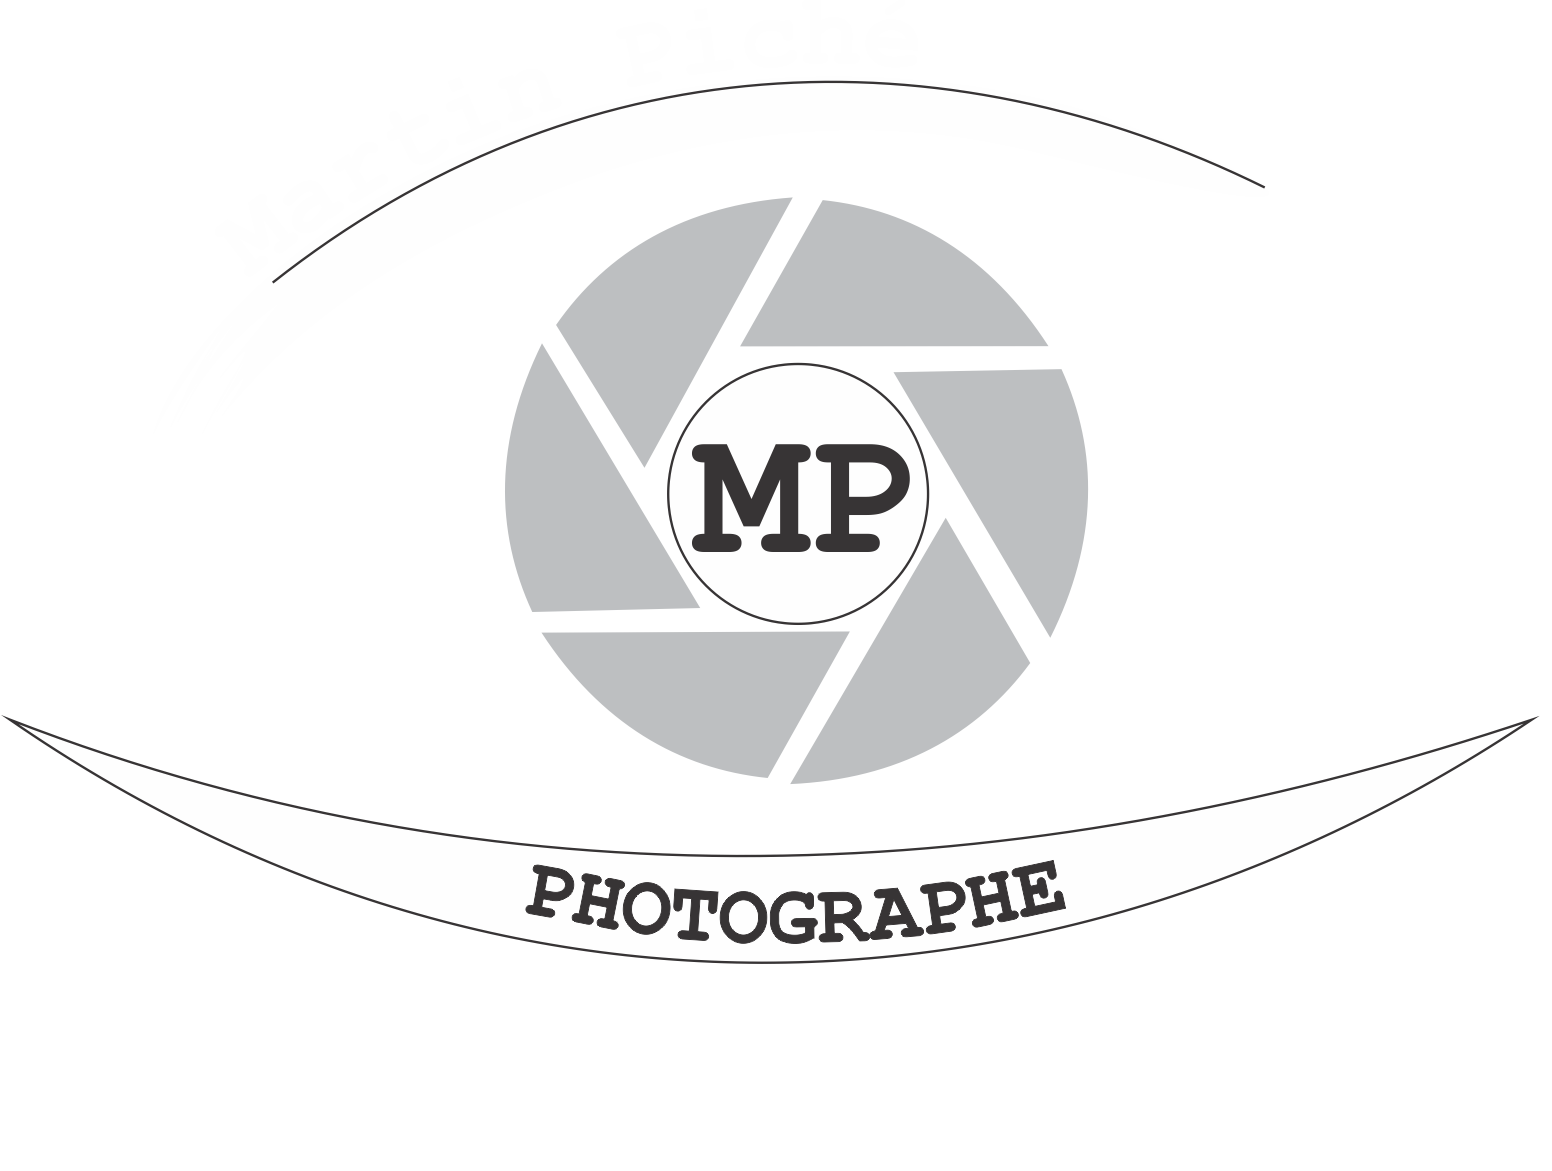 Martin Piché - Photographe